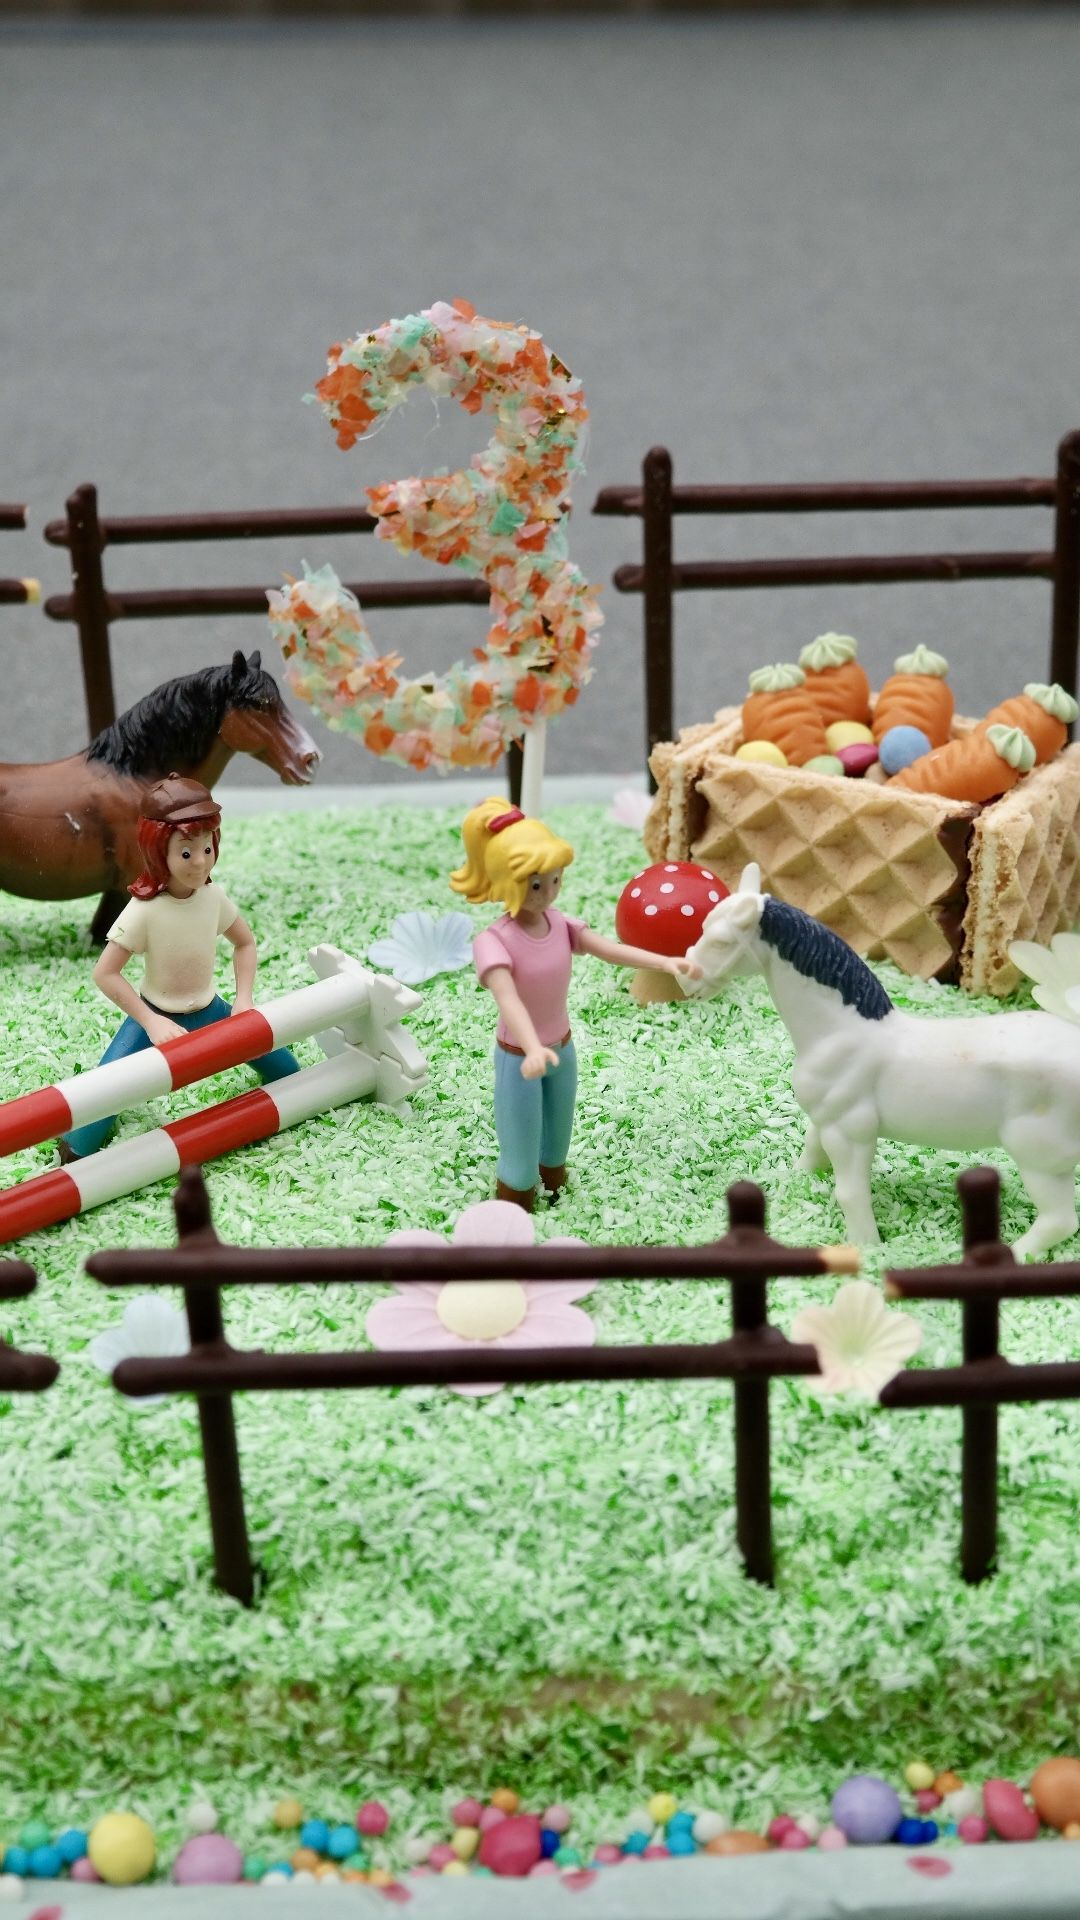 Bibi Und Tina Torte Zum Kindergeburtstag Bibi Und Tina Torte Pferdeparty Kindergeburtstag Geburtstagstorte Kinder